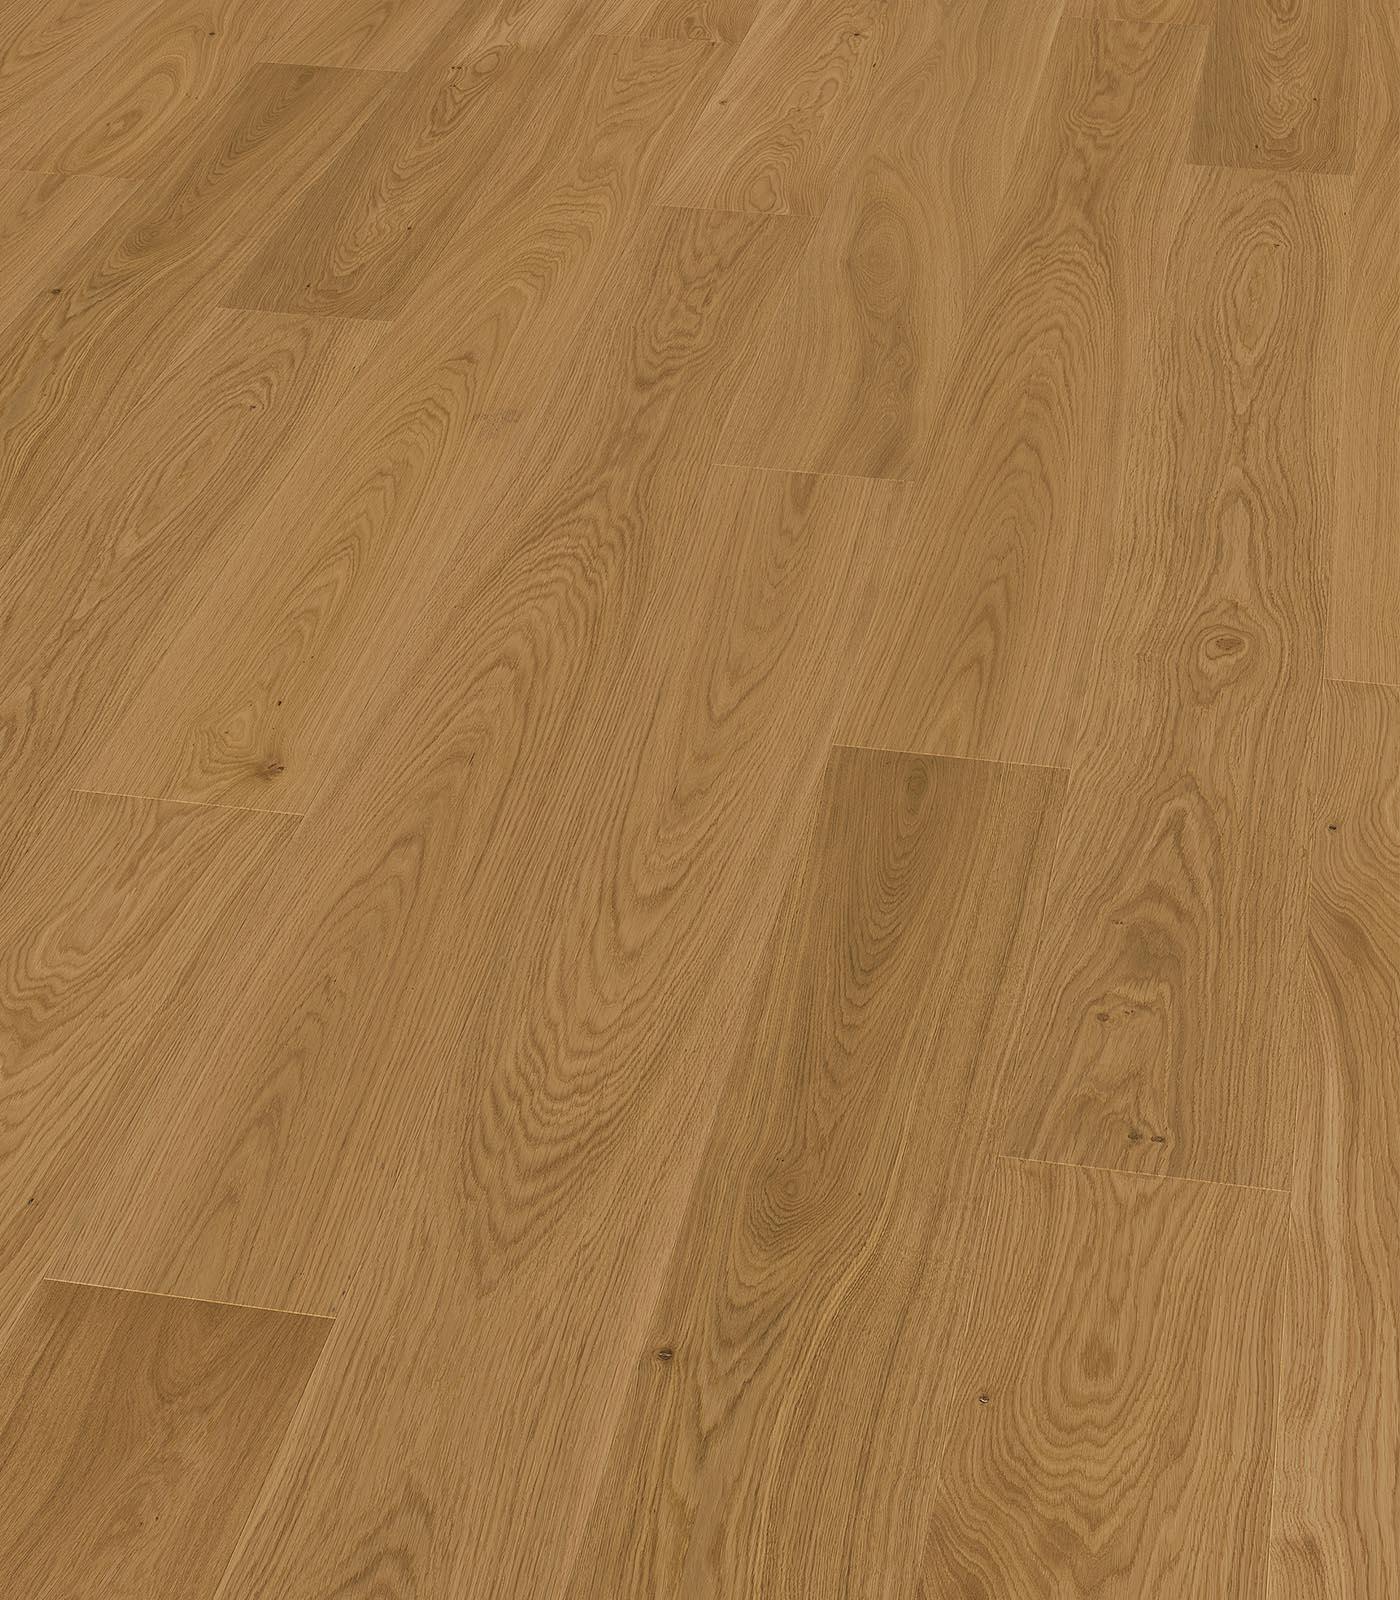 Oak-Prima-Origins-collection-European-Oak-Floors-Angle